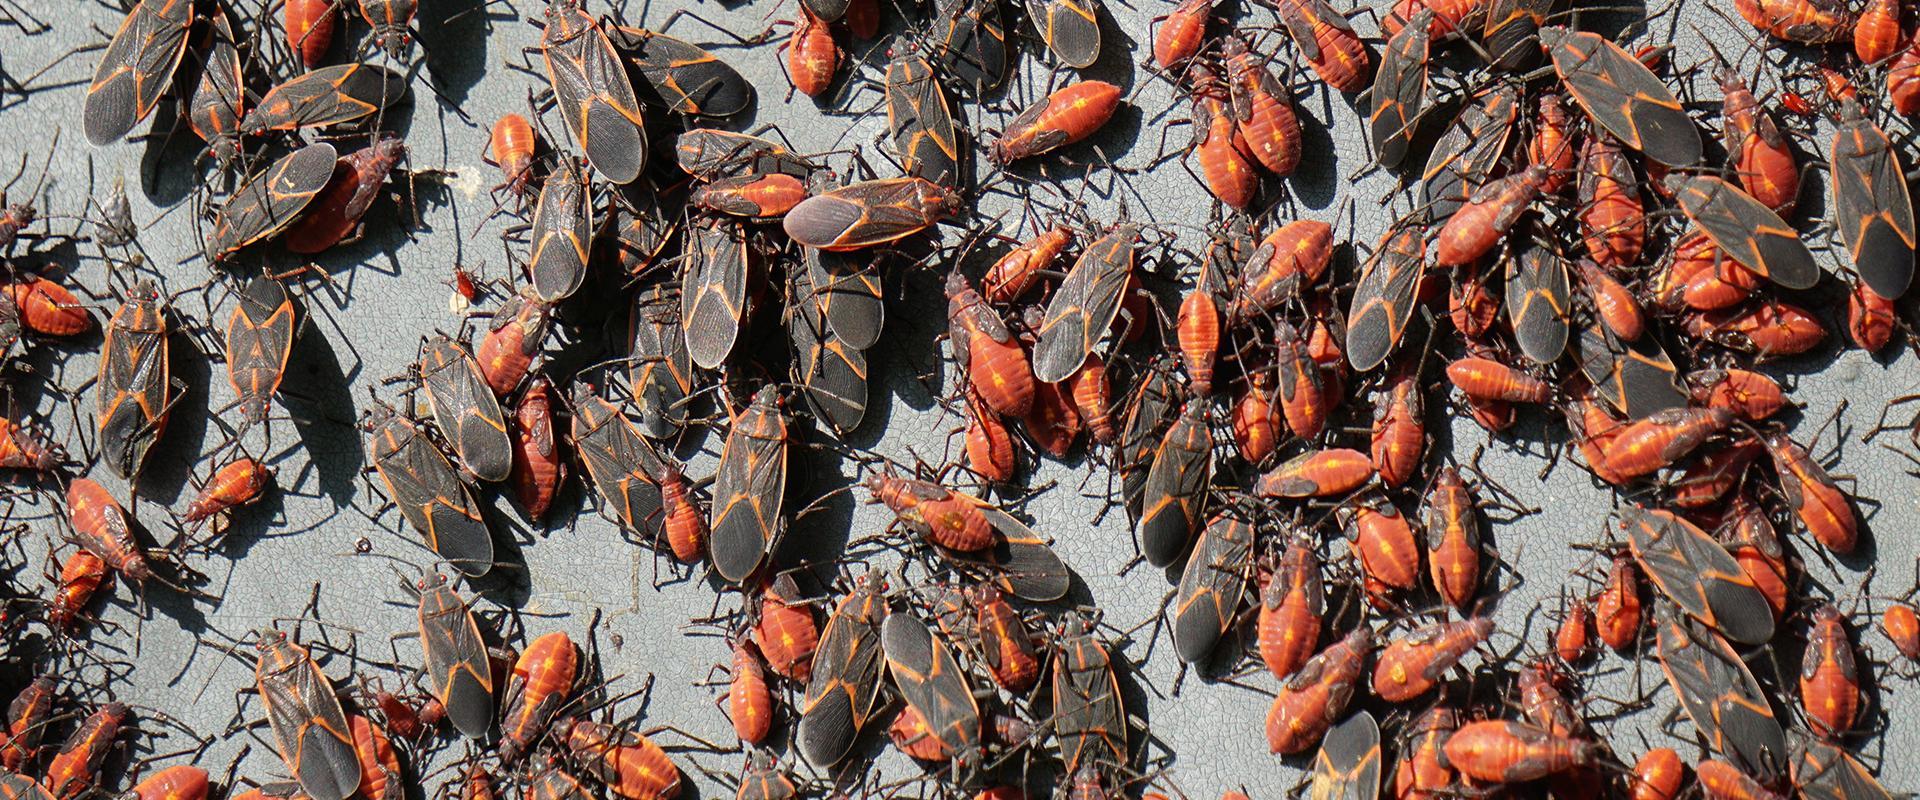 many box elder bugs